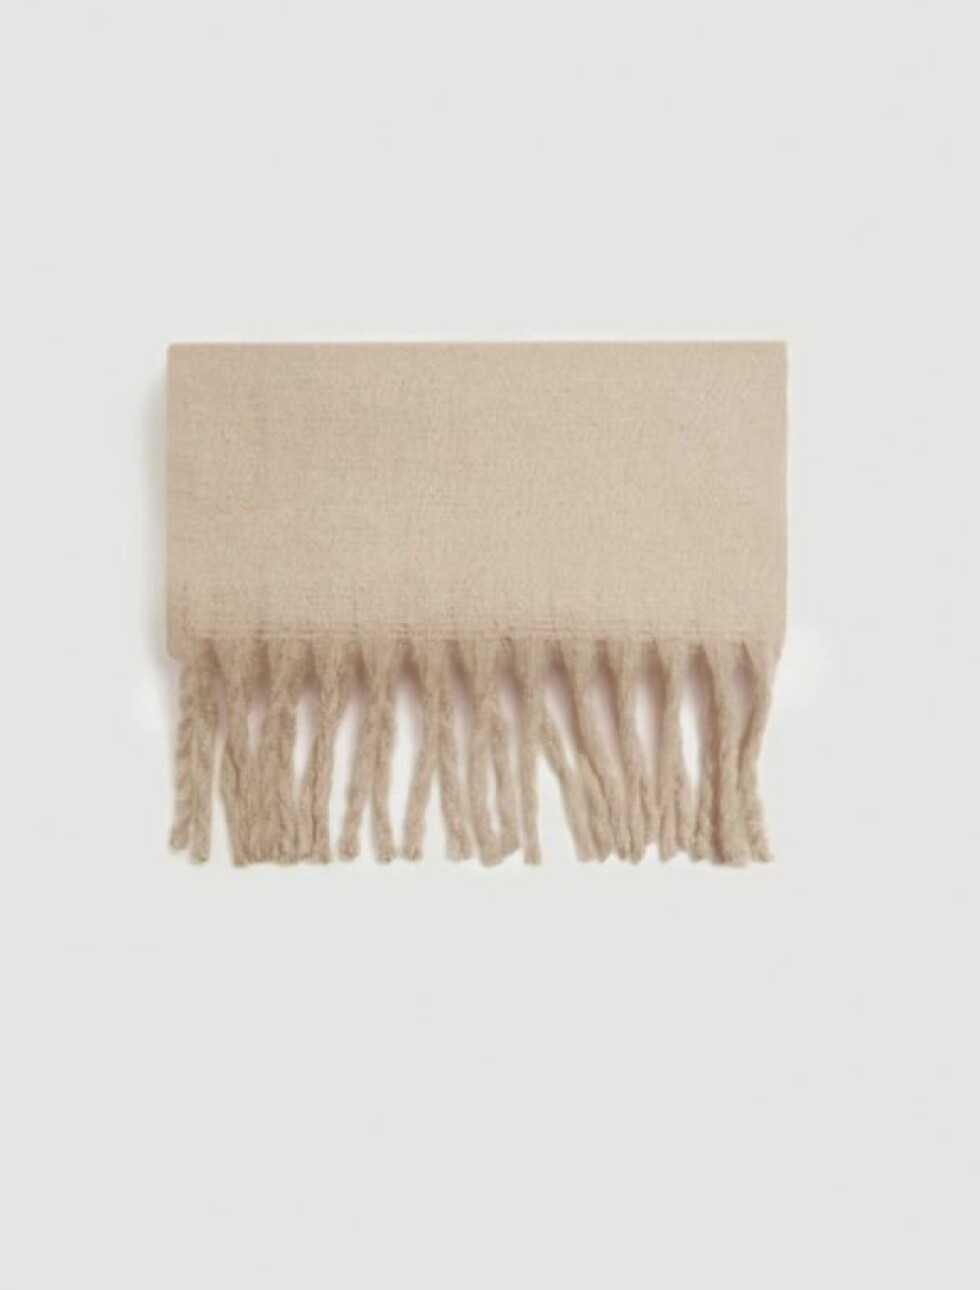 Skjerf fra Mango  299,-  https://shop.mango.com/no-en/women/scarves-and-foulards/textured-maxi-scarf_33013765.html?c=08&n=1&s=accesorios_she.accesorio;52,452